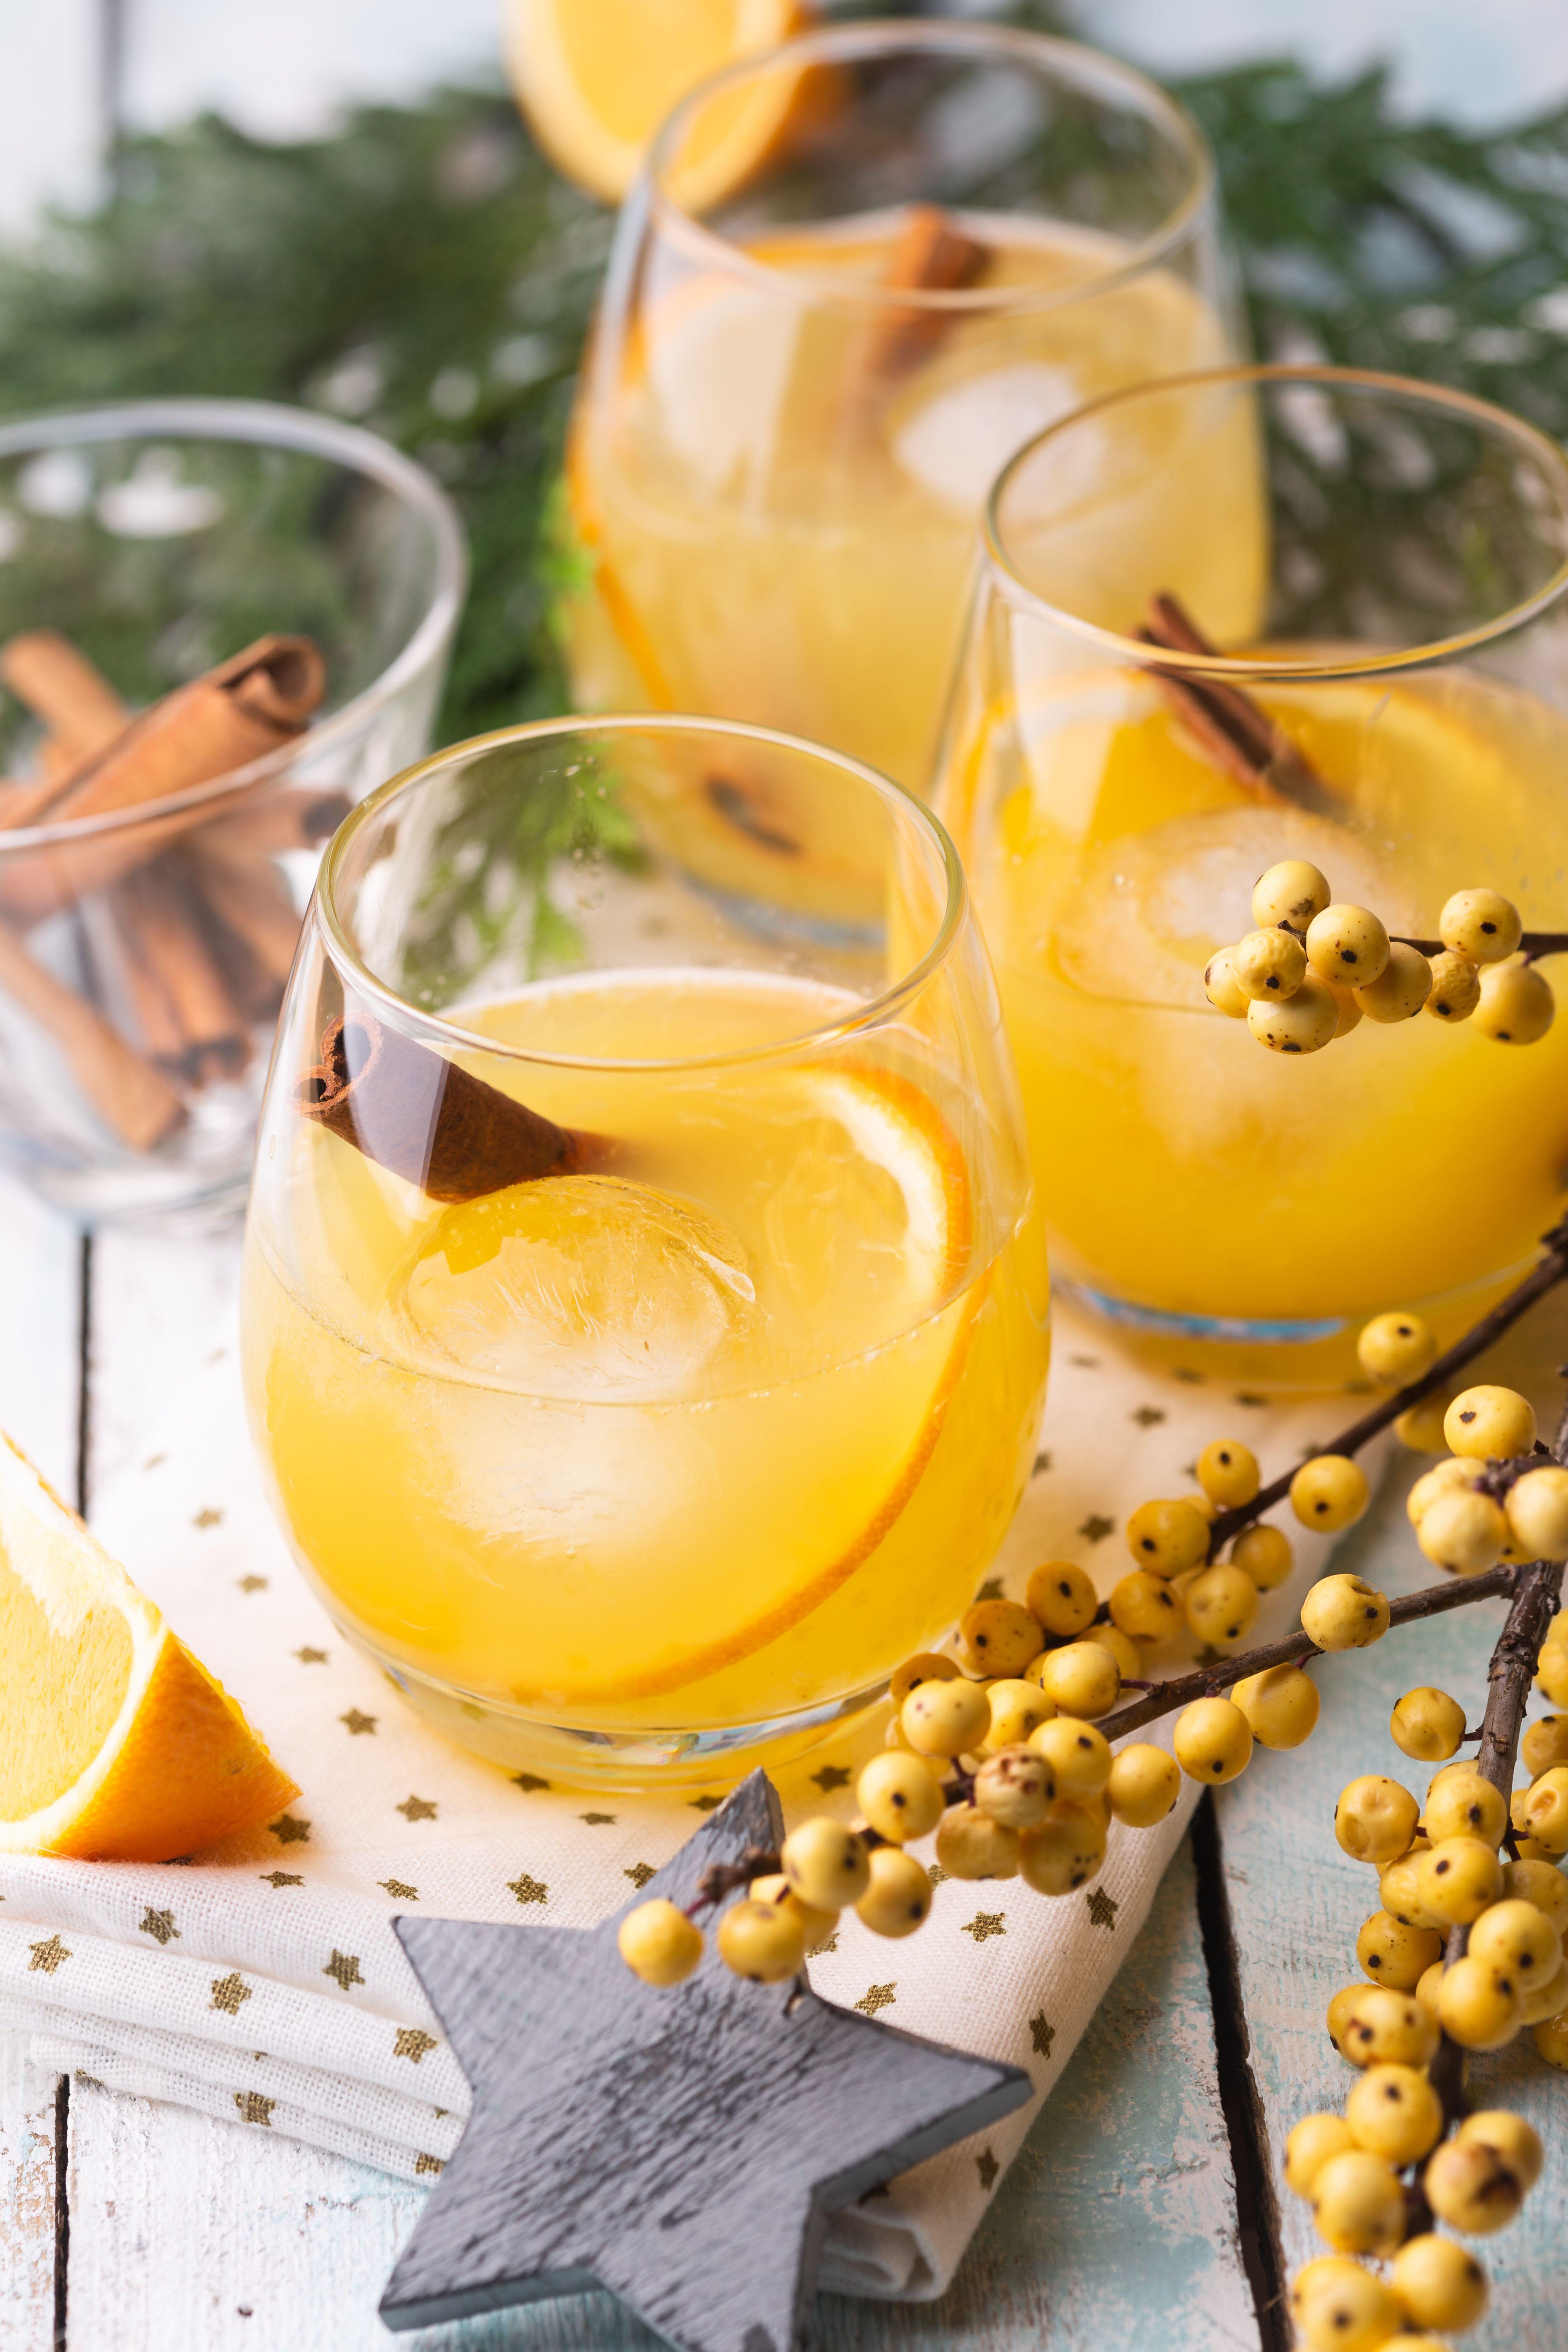 Orange Pineapple Cocktail كوكتيل البرتقال والأناناس Pineapple Cocktail Foodie Inspiration Pineapple Juice